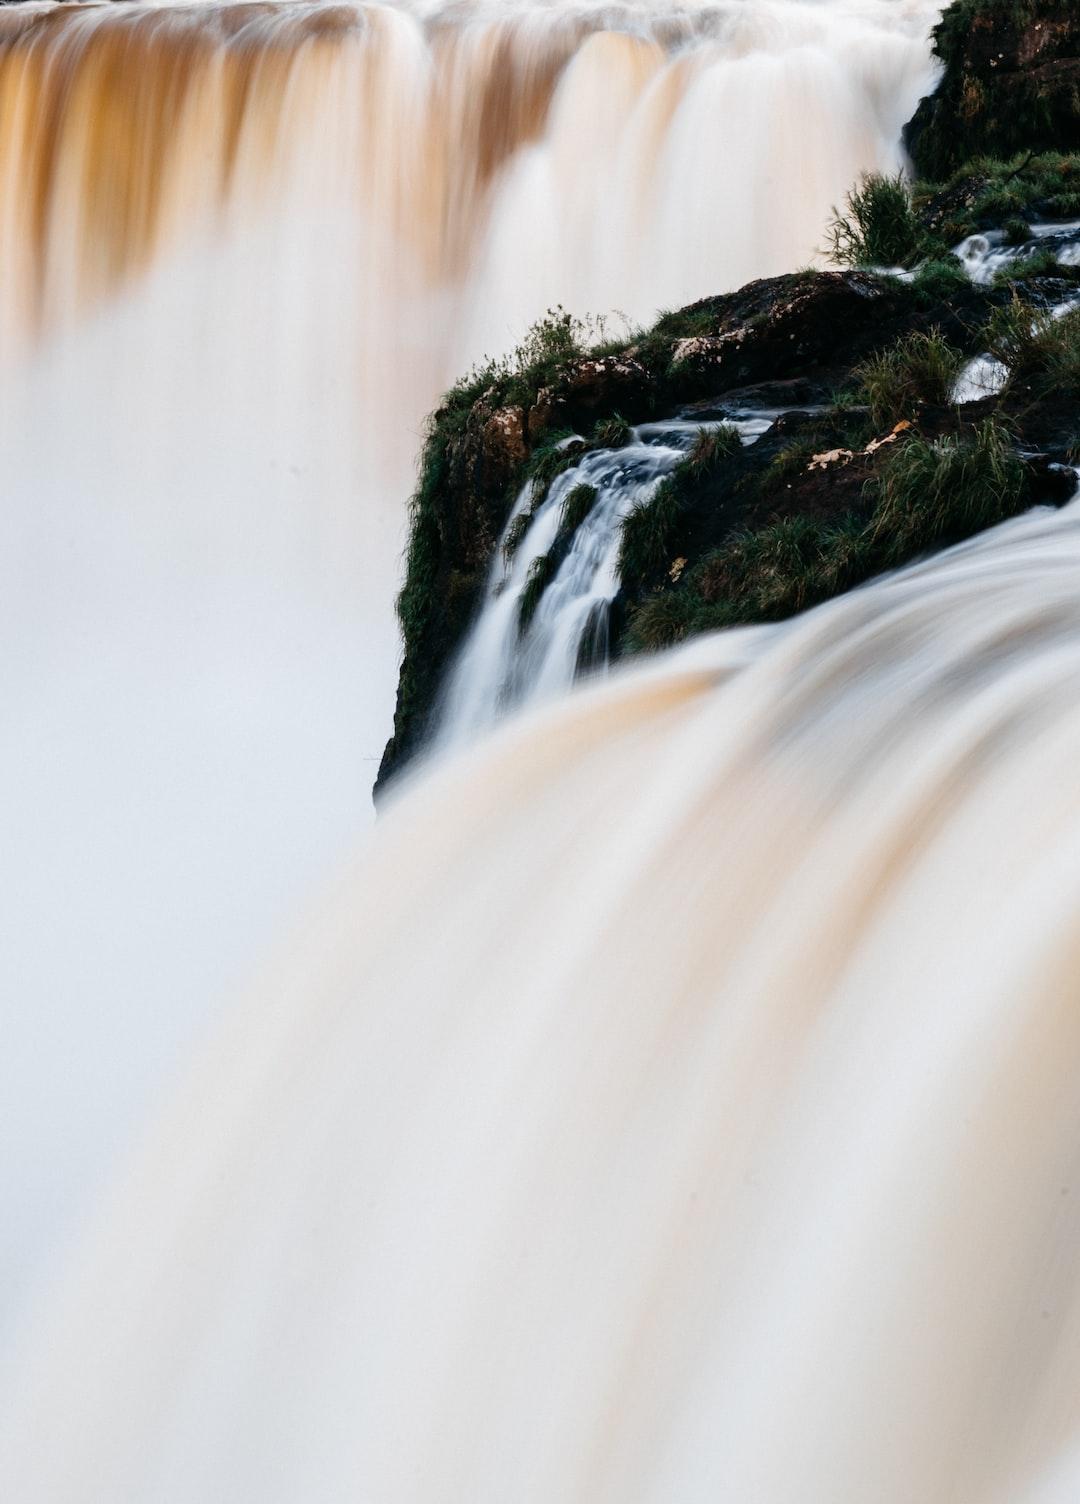 Salto Monday waterfalls in Paraguay